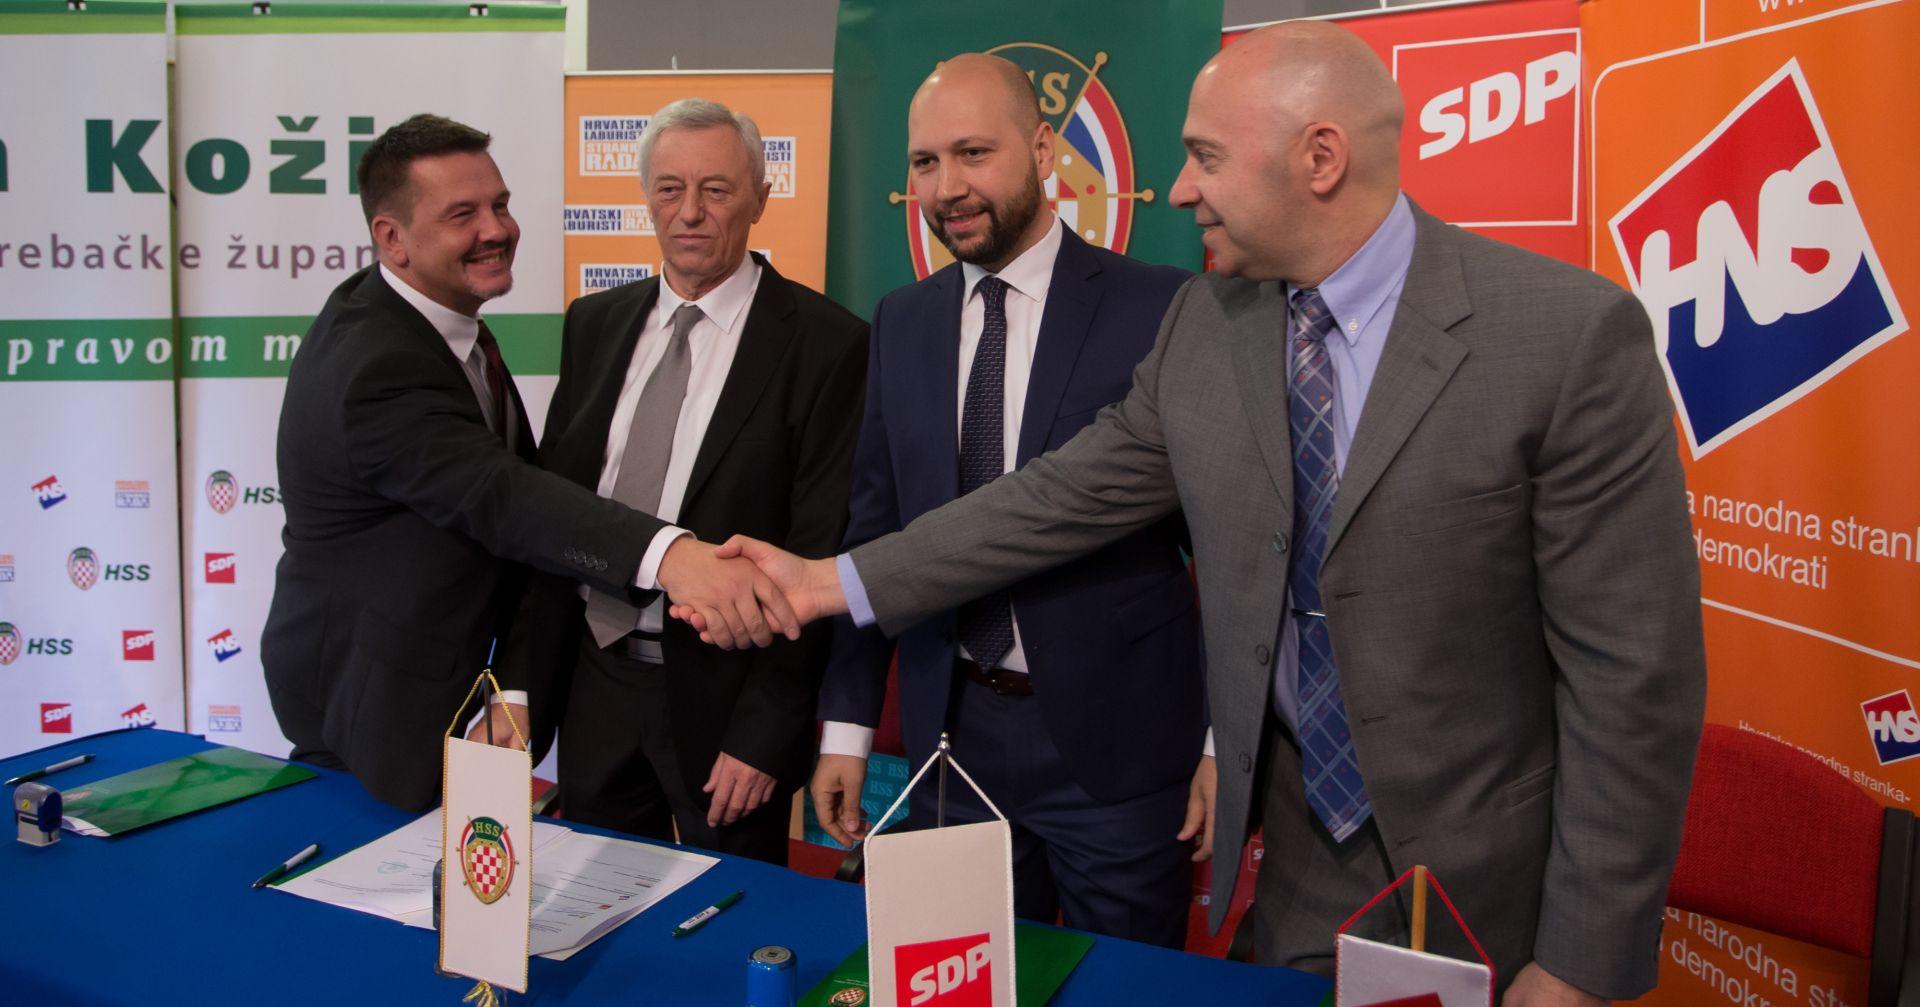 Potpisani sporazumi HSS-a i SDP-a za Samobor te HSS-a, SDP-a, HNS-a i Laburista za Zagrebačku županiju